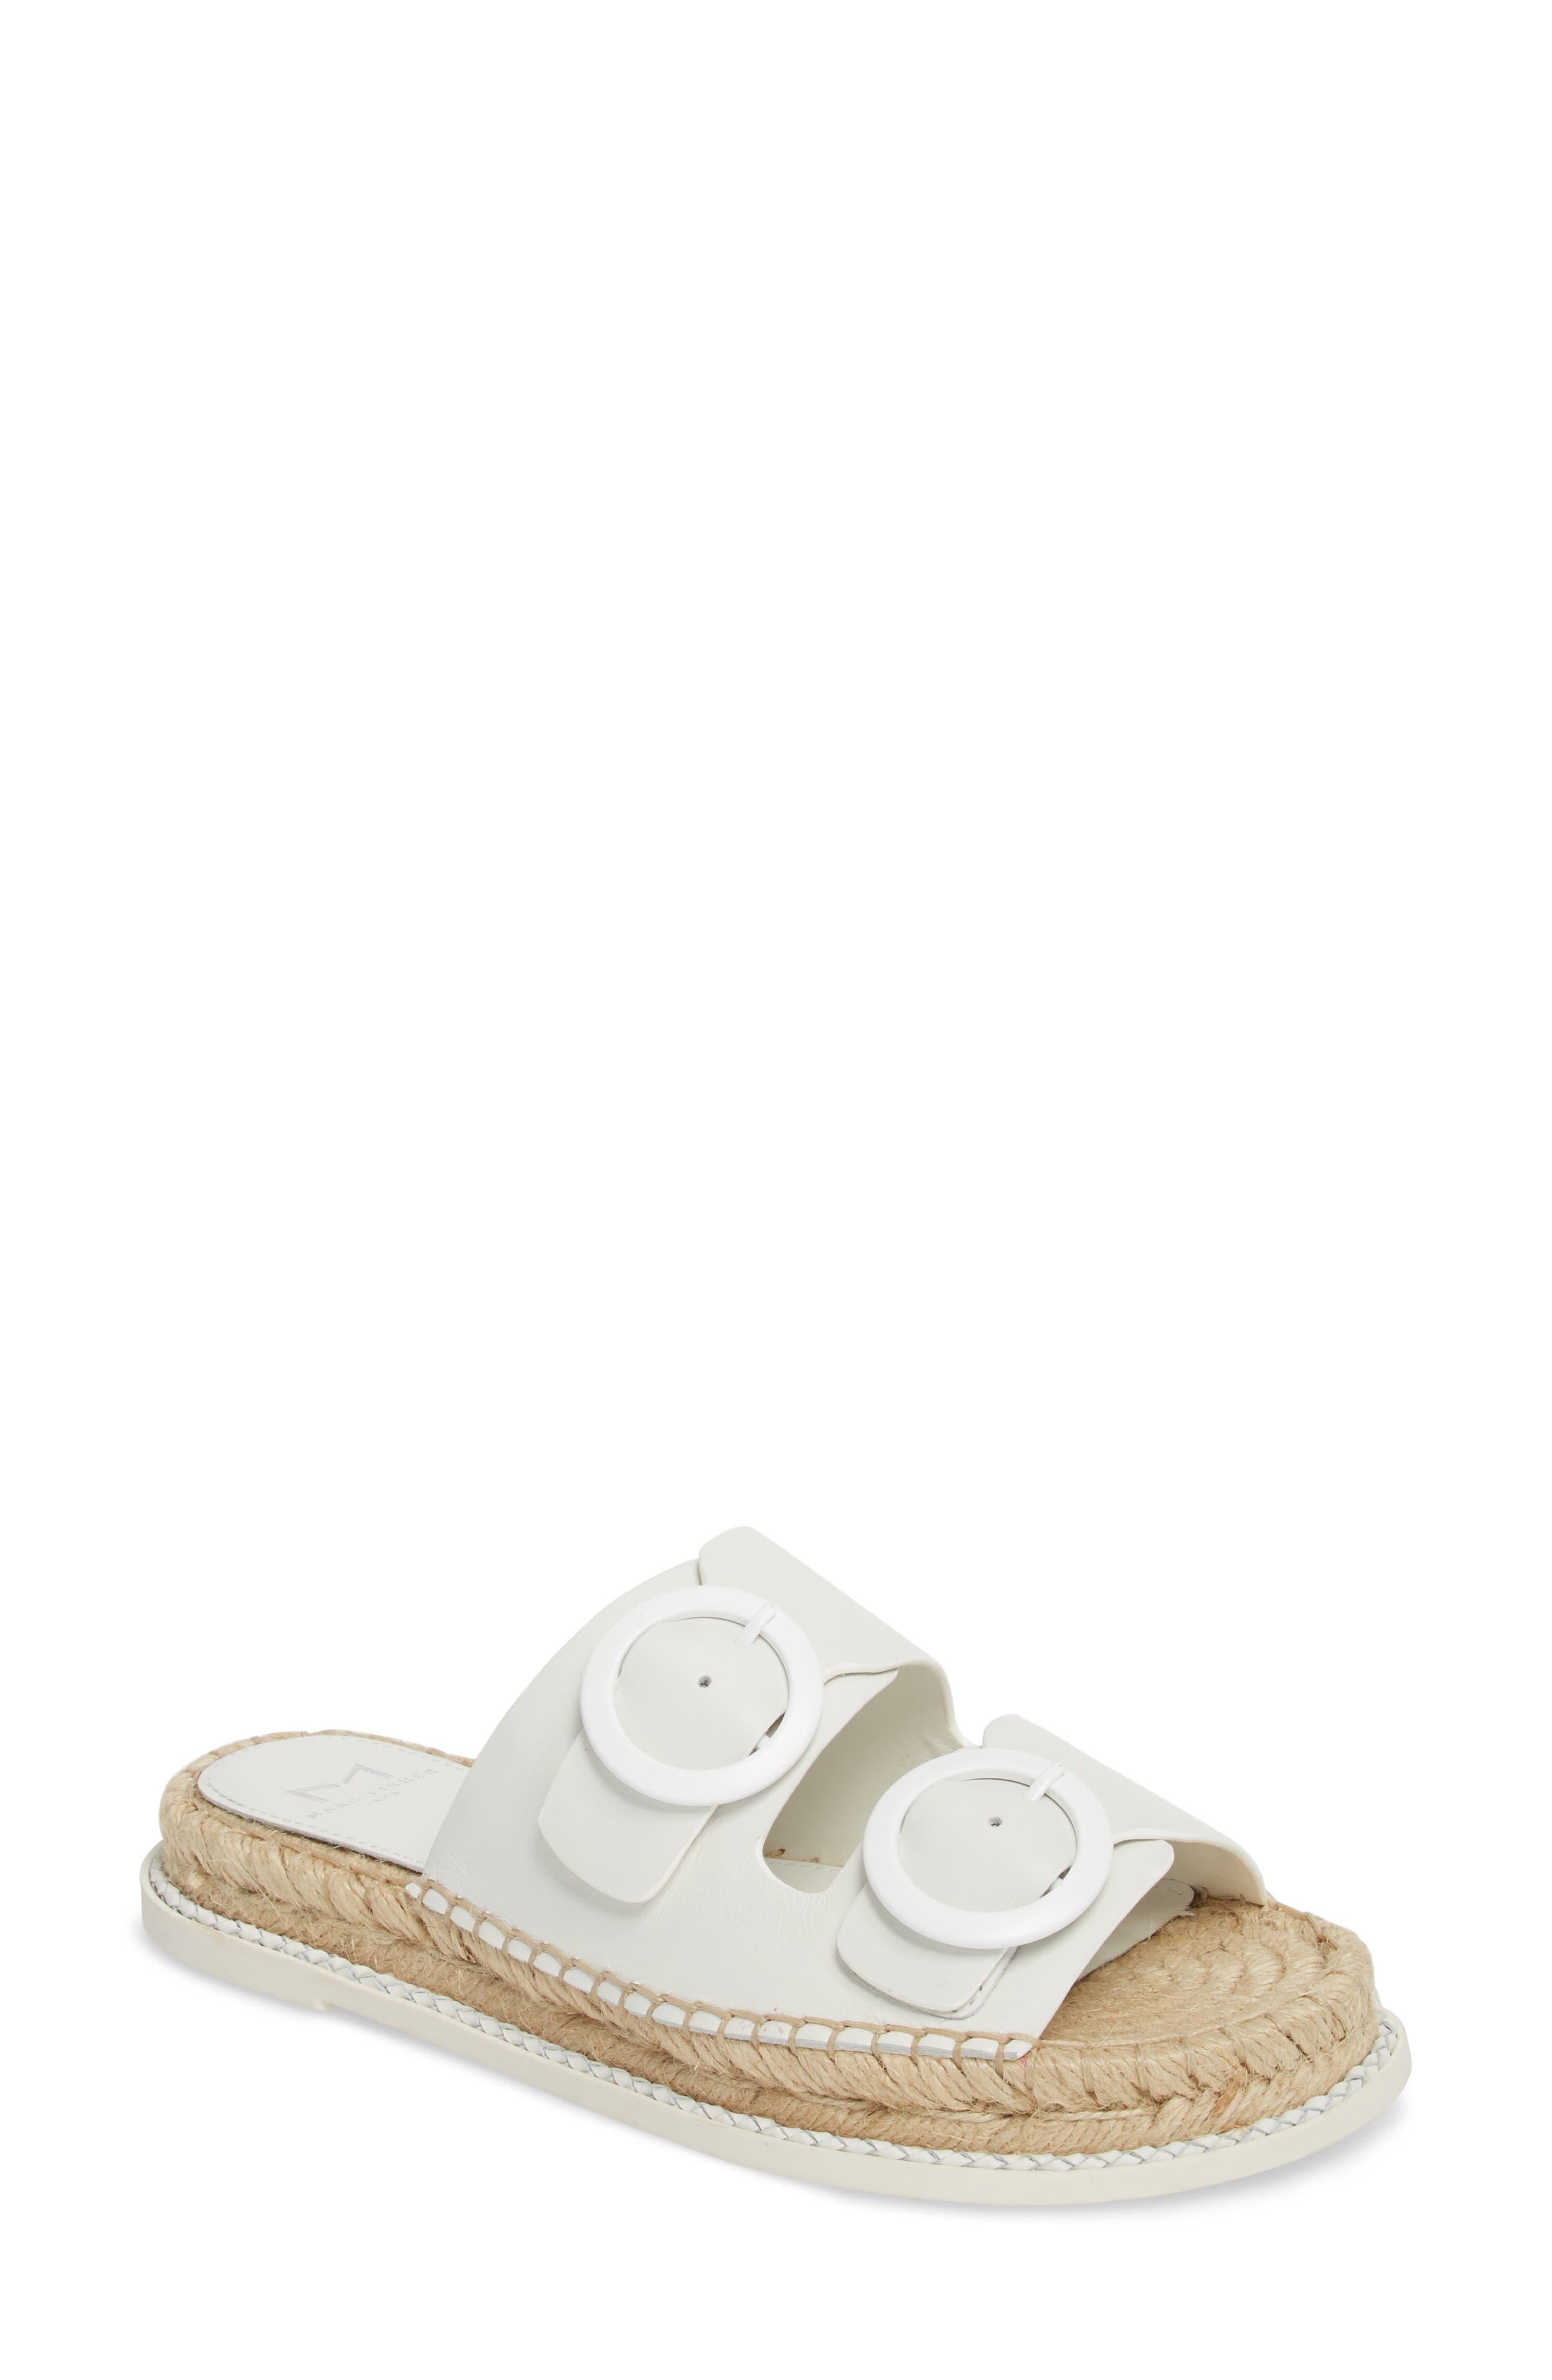 Ramba Espadrille Slide Sandal,                         Main,                         color, 112